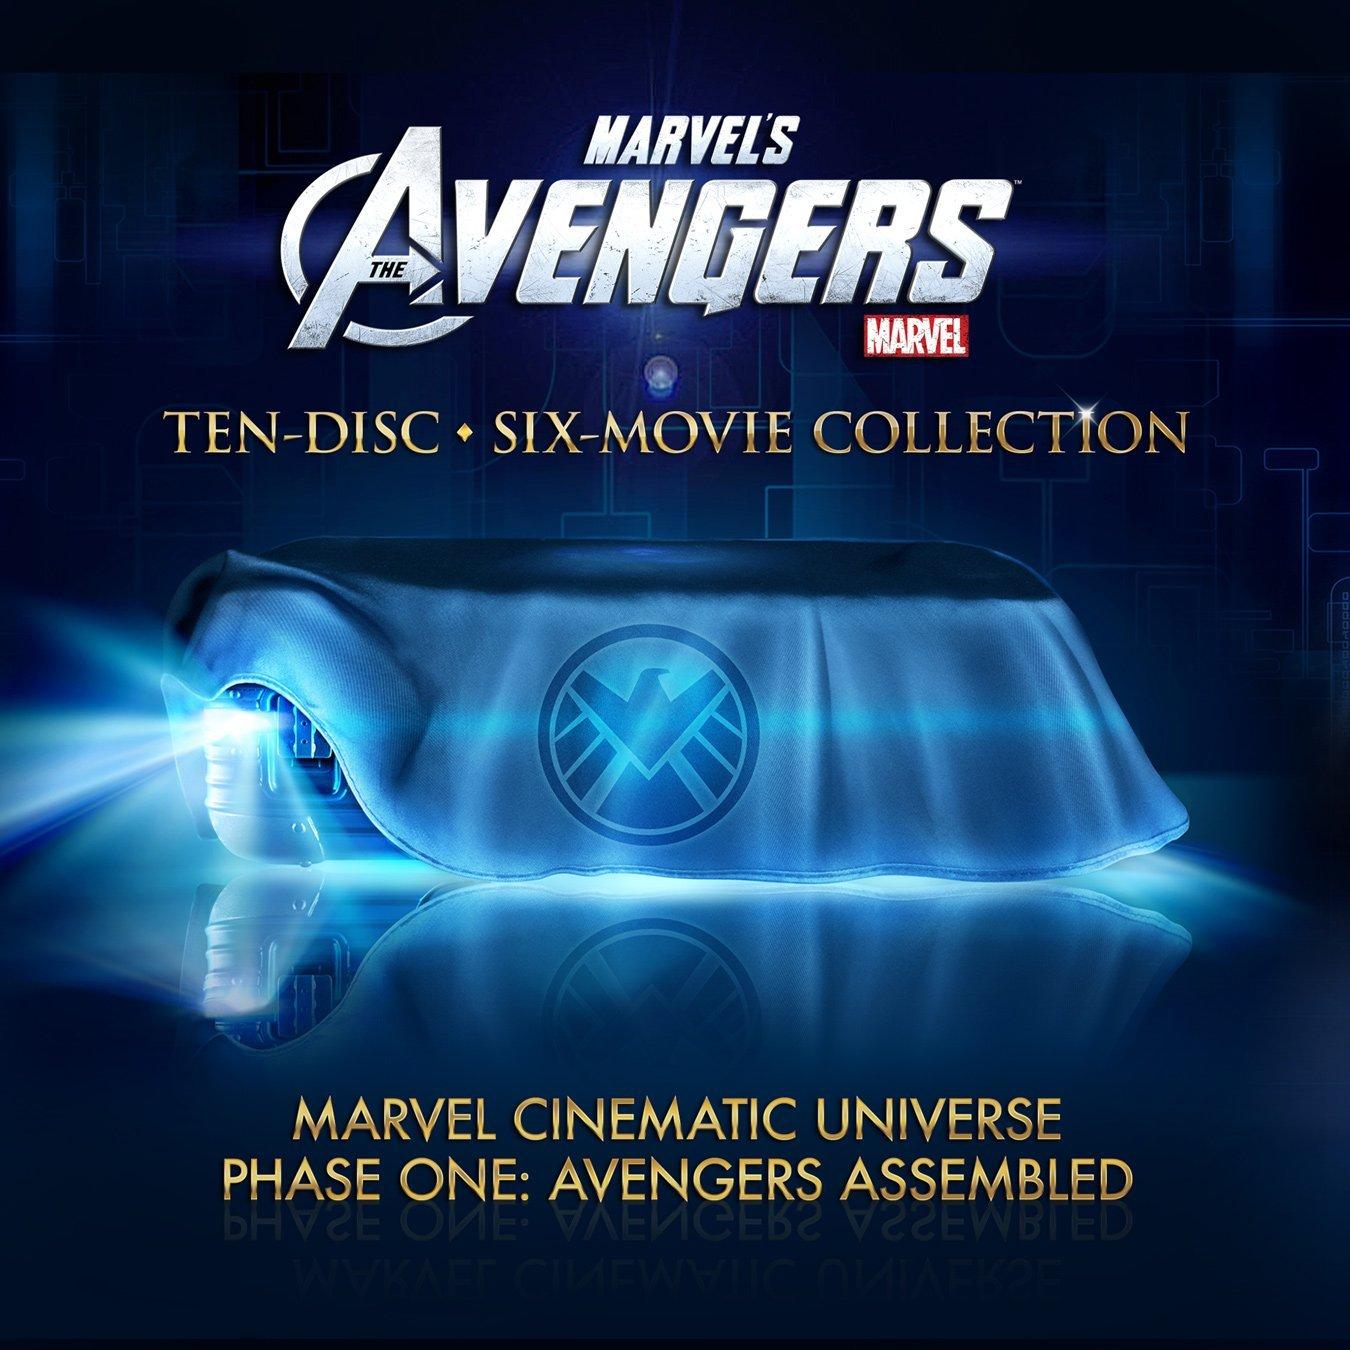 Marvel's Avengers, Image Credit: Amazon